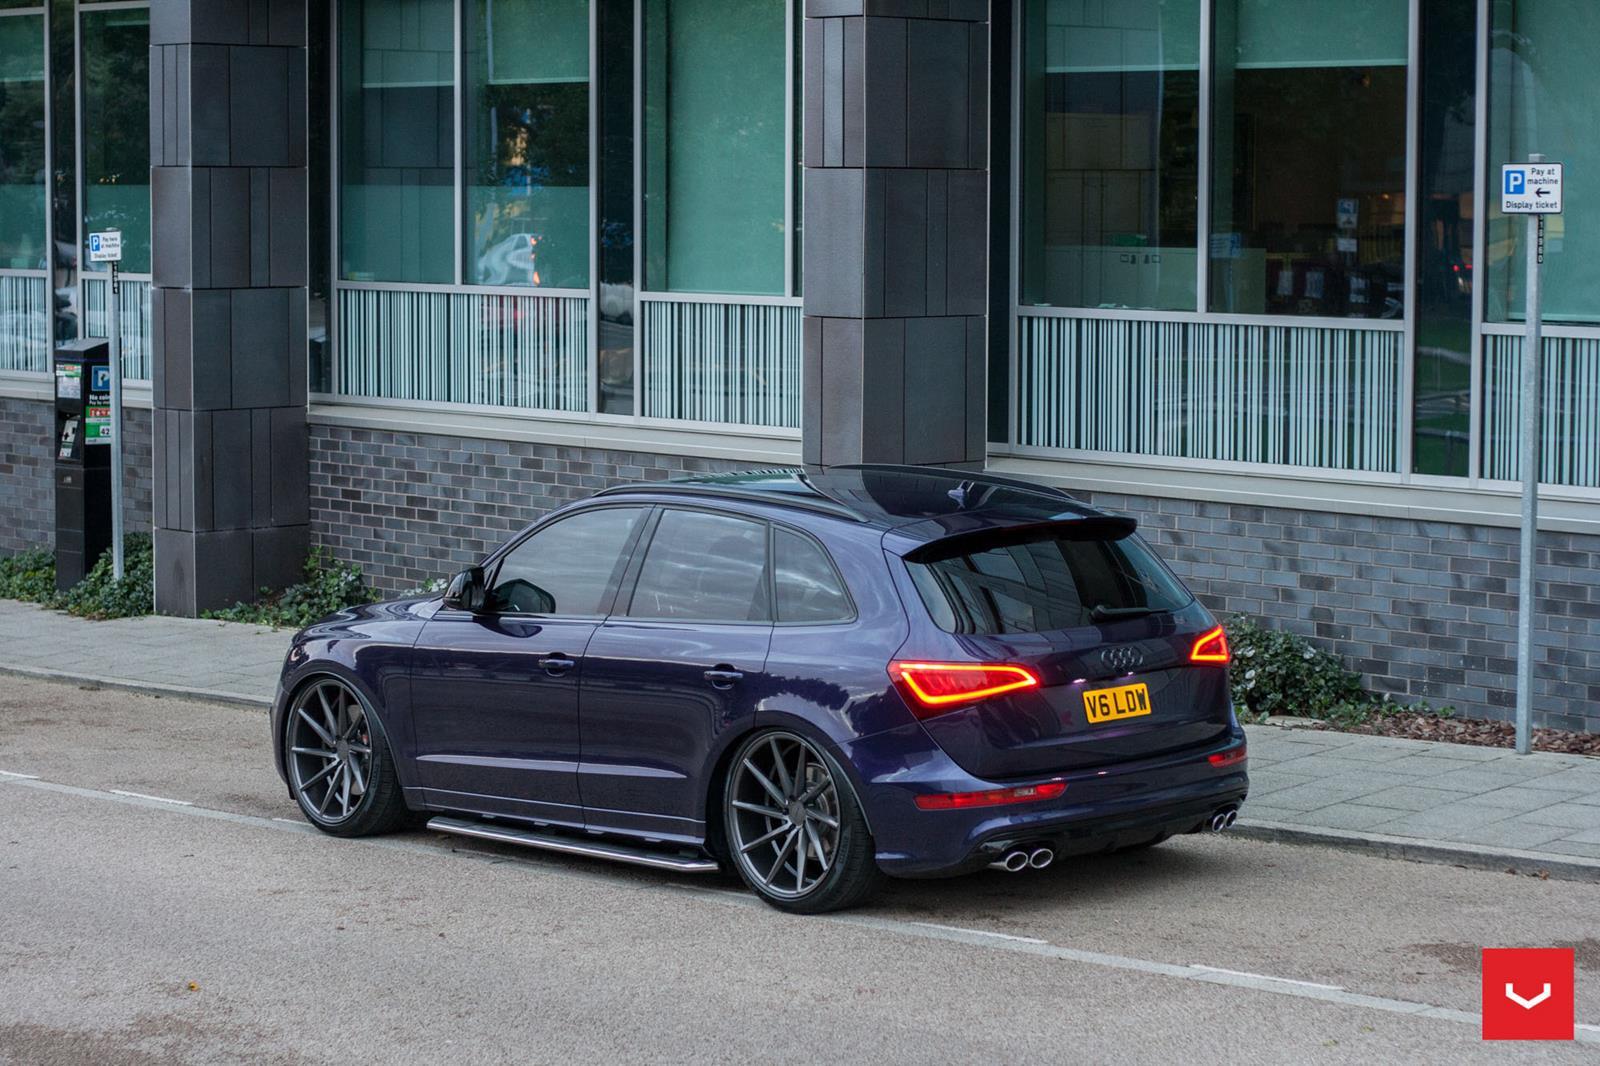 2018 Audi Q5 SUV quattro  Overview amp Price  Audi USA